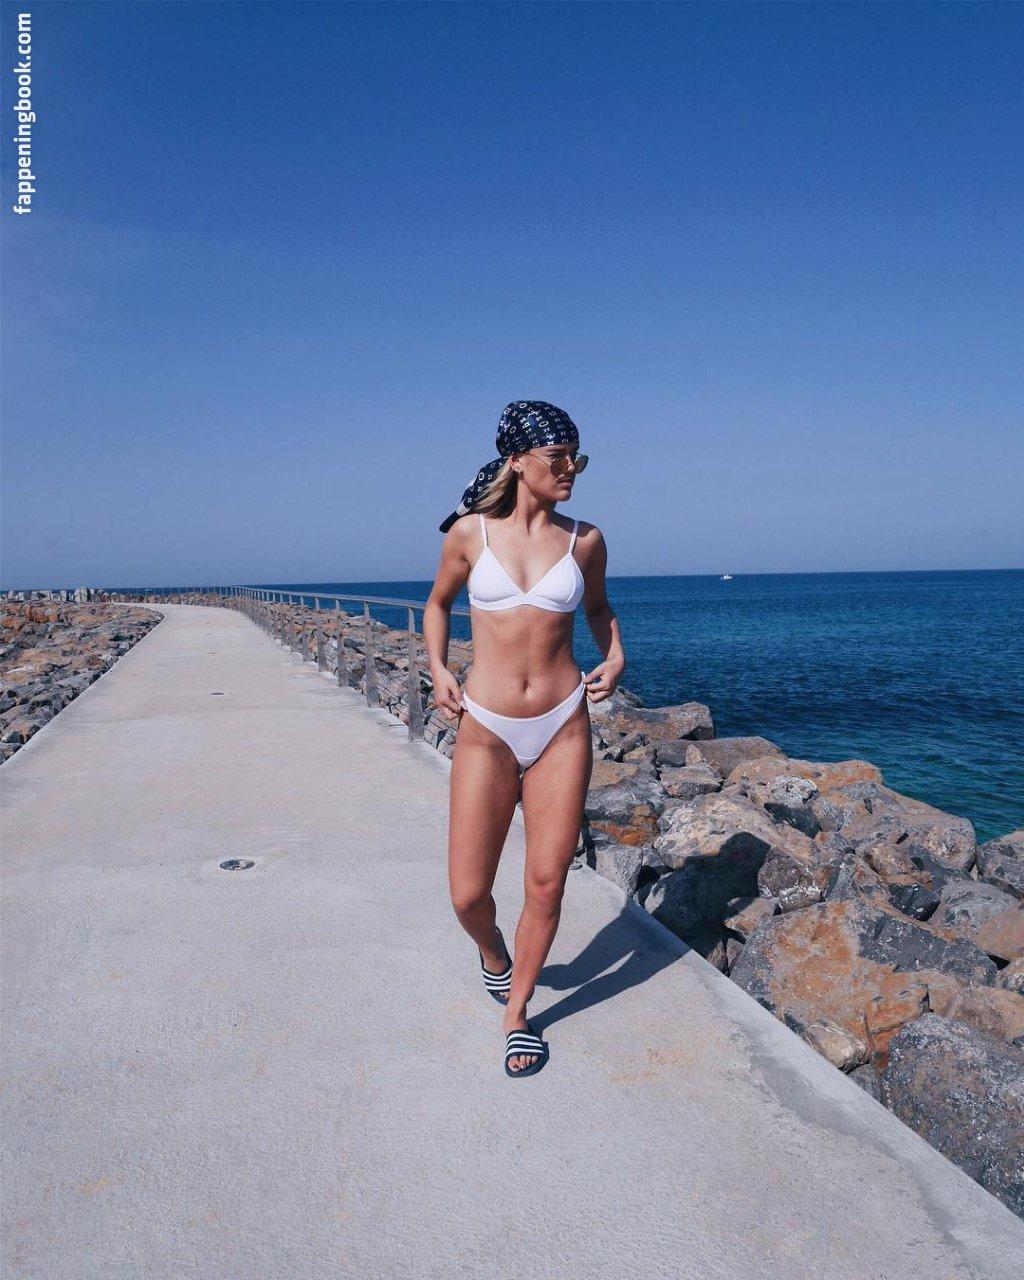 Amanda nackt Winberg Best 52+